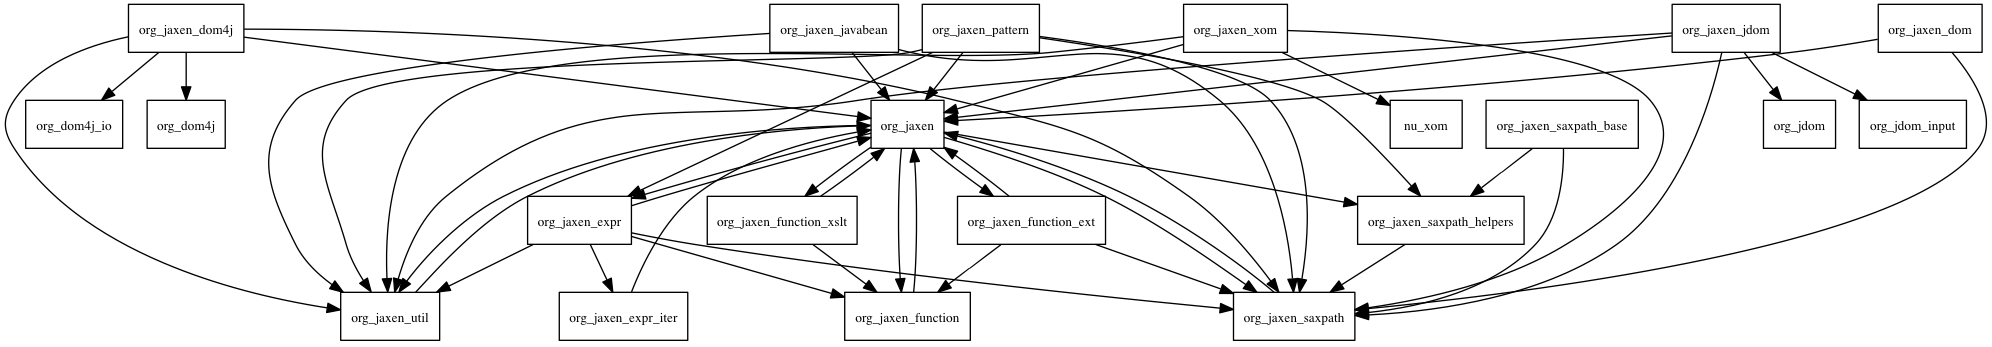 JBoss Tattletale 1.2.0.Beta2: Graphical dependencies